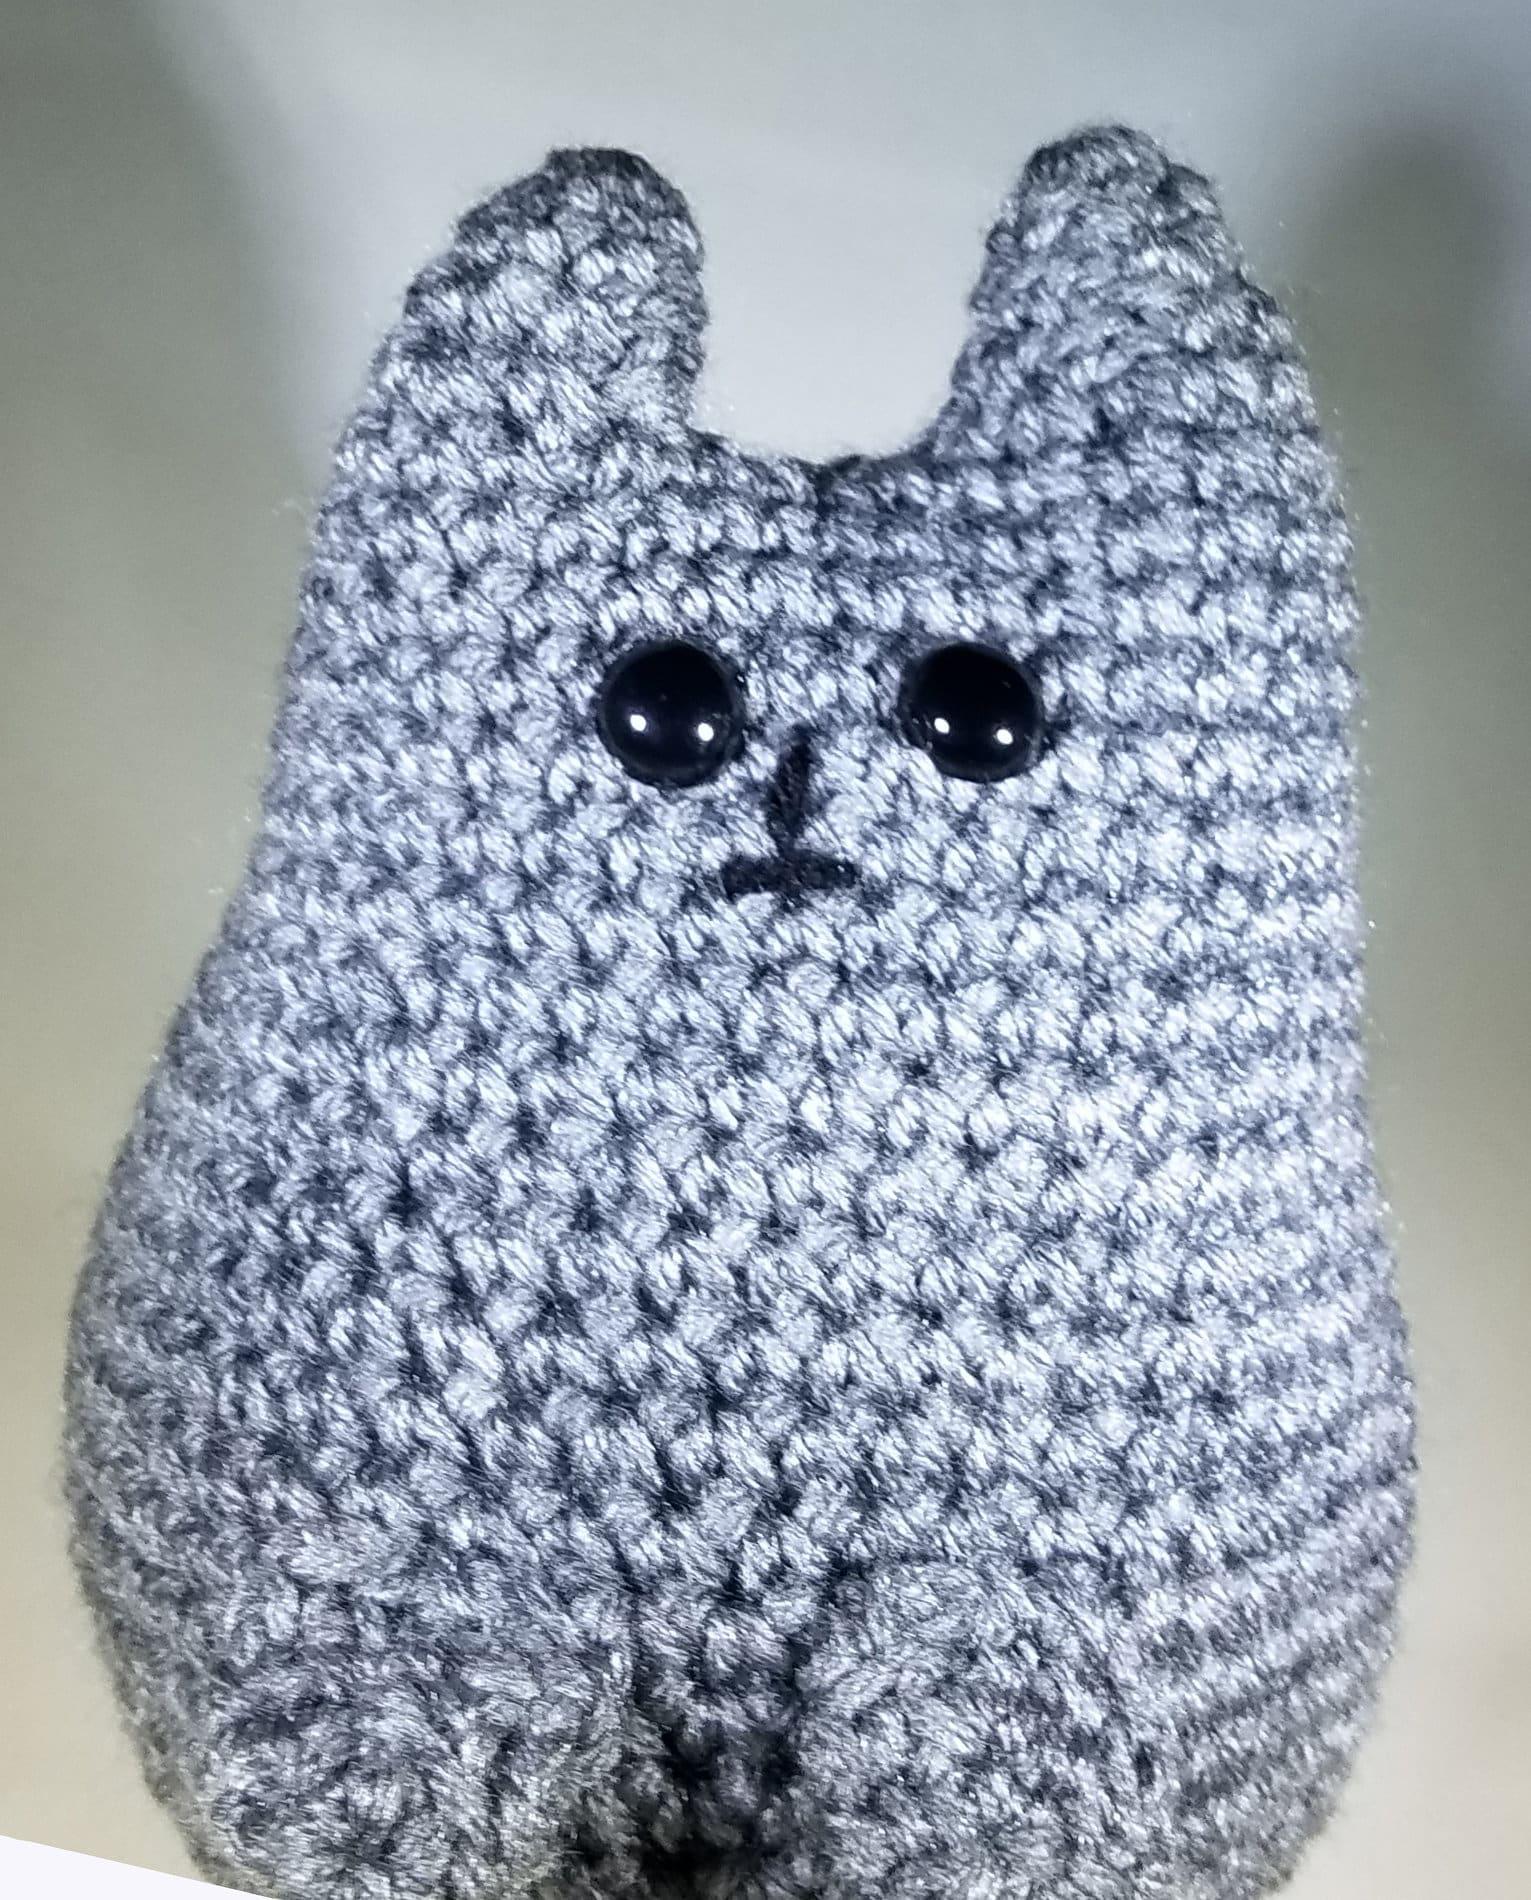 Dumpling Cats: Crochet and Collect Them All!: Amazon.de: Sarah ... | 1900x1531